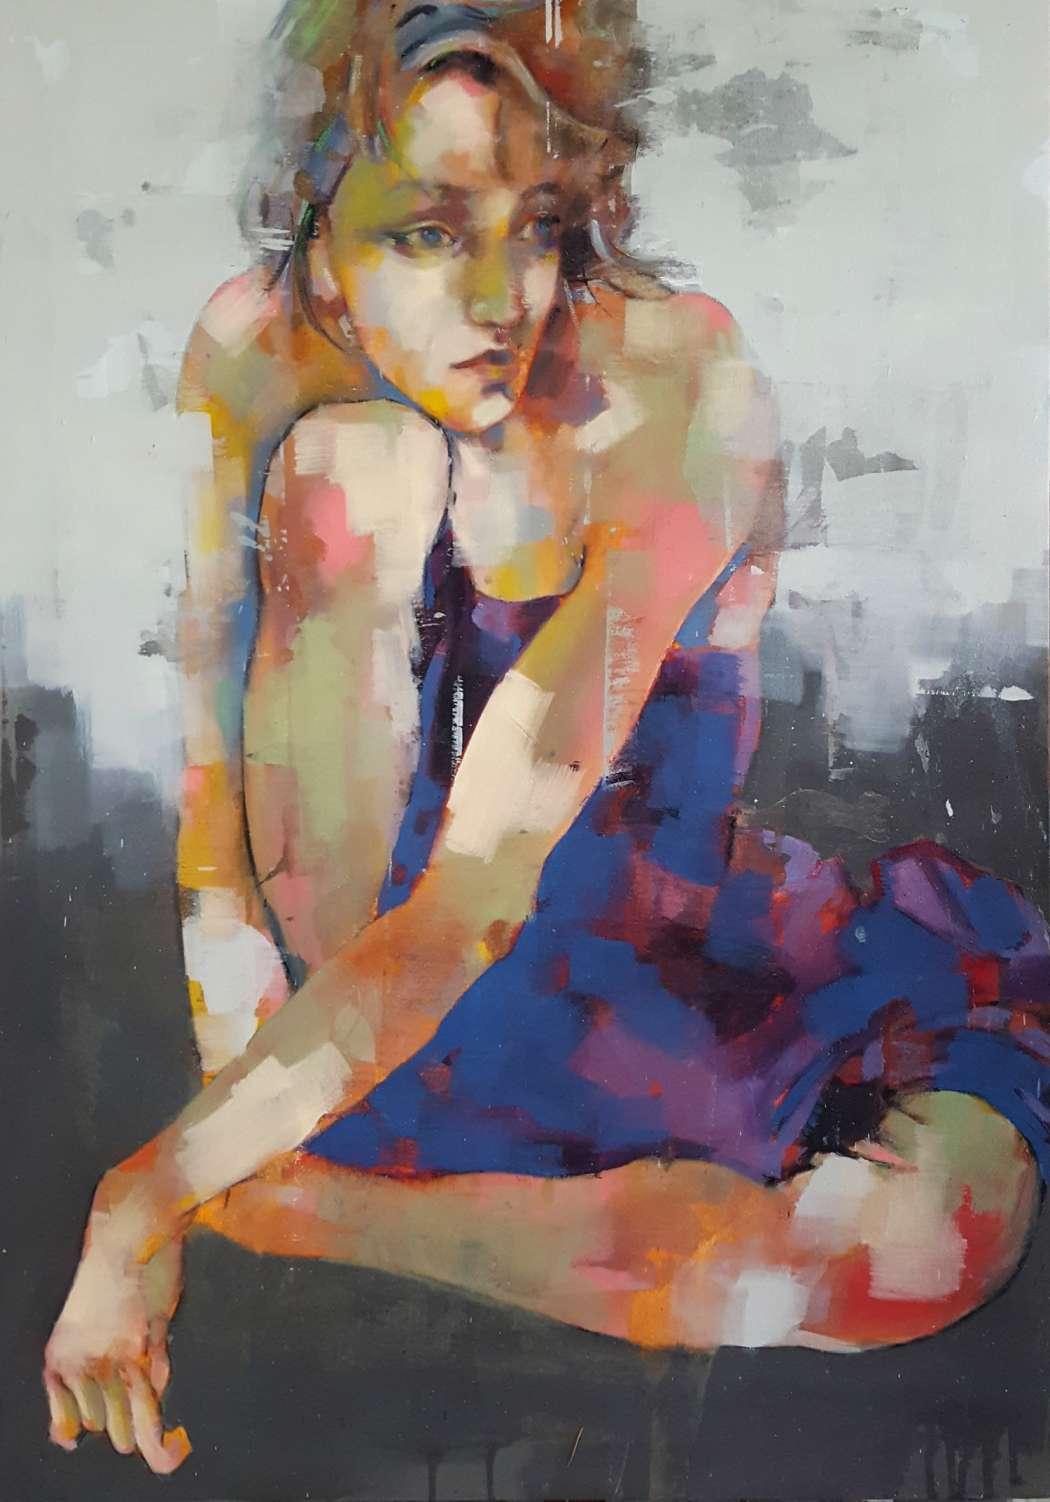 Crouching figure 2-12-20